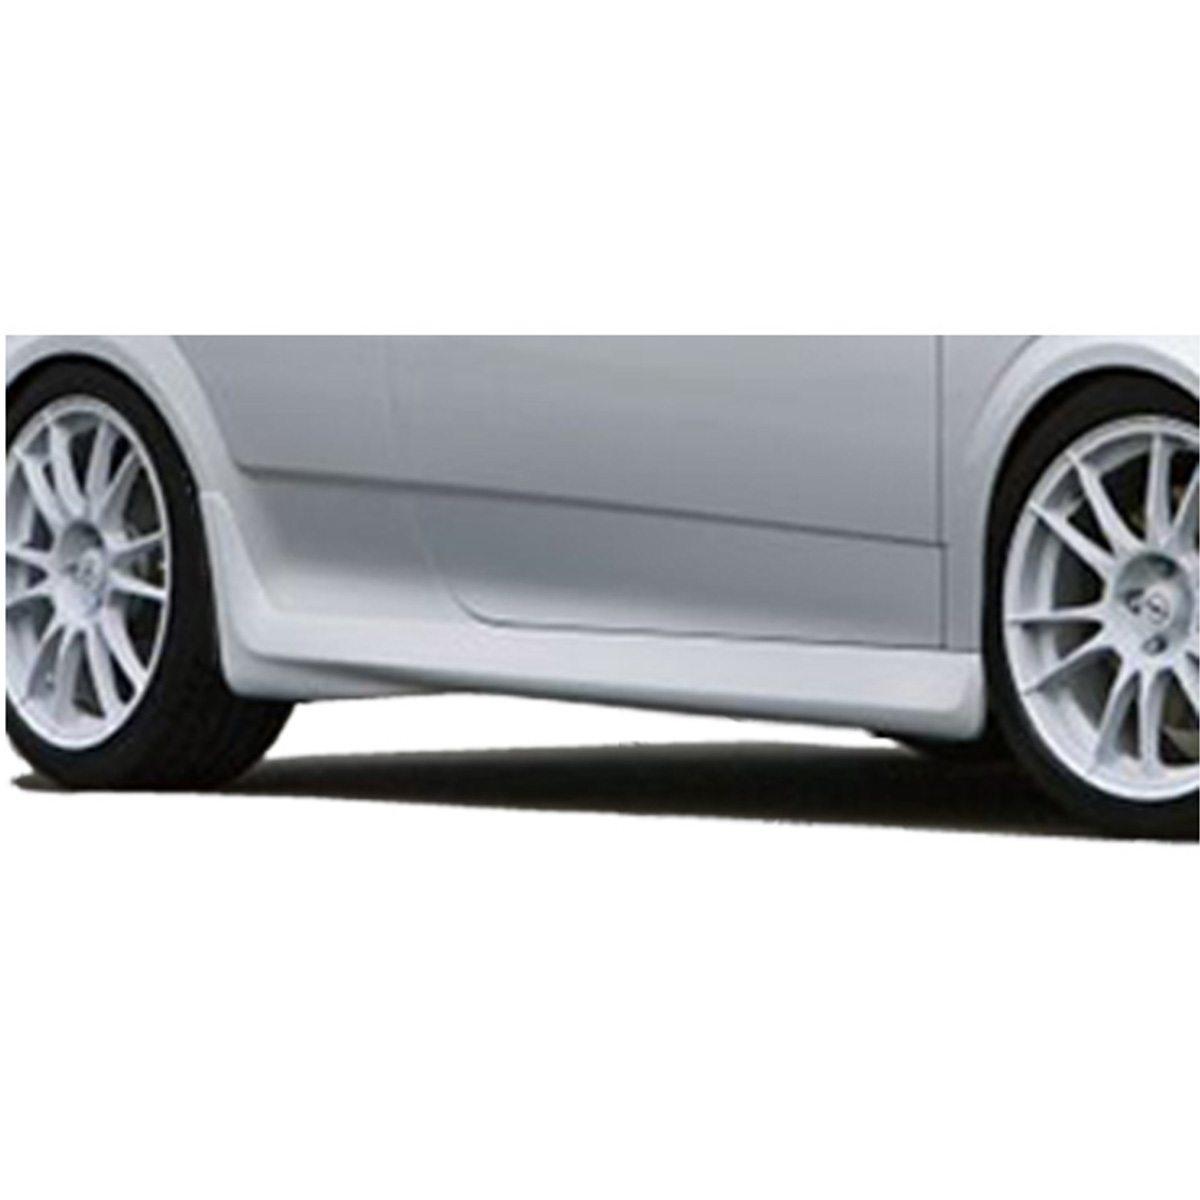 Opel-Astra-H-OPC-Emb-EBU0478